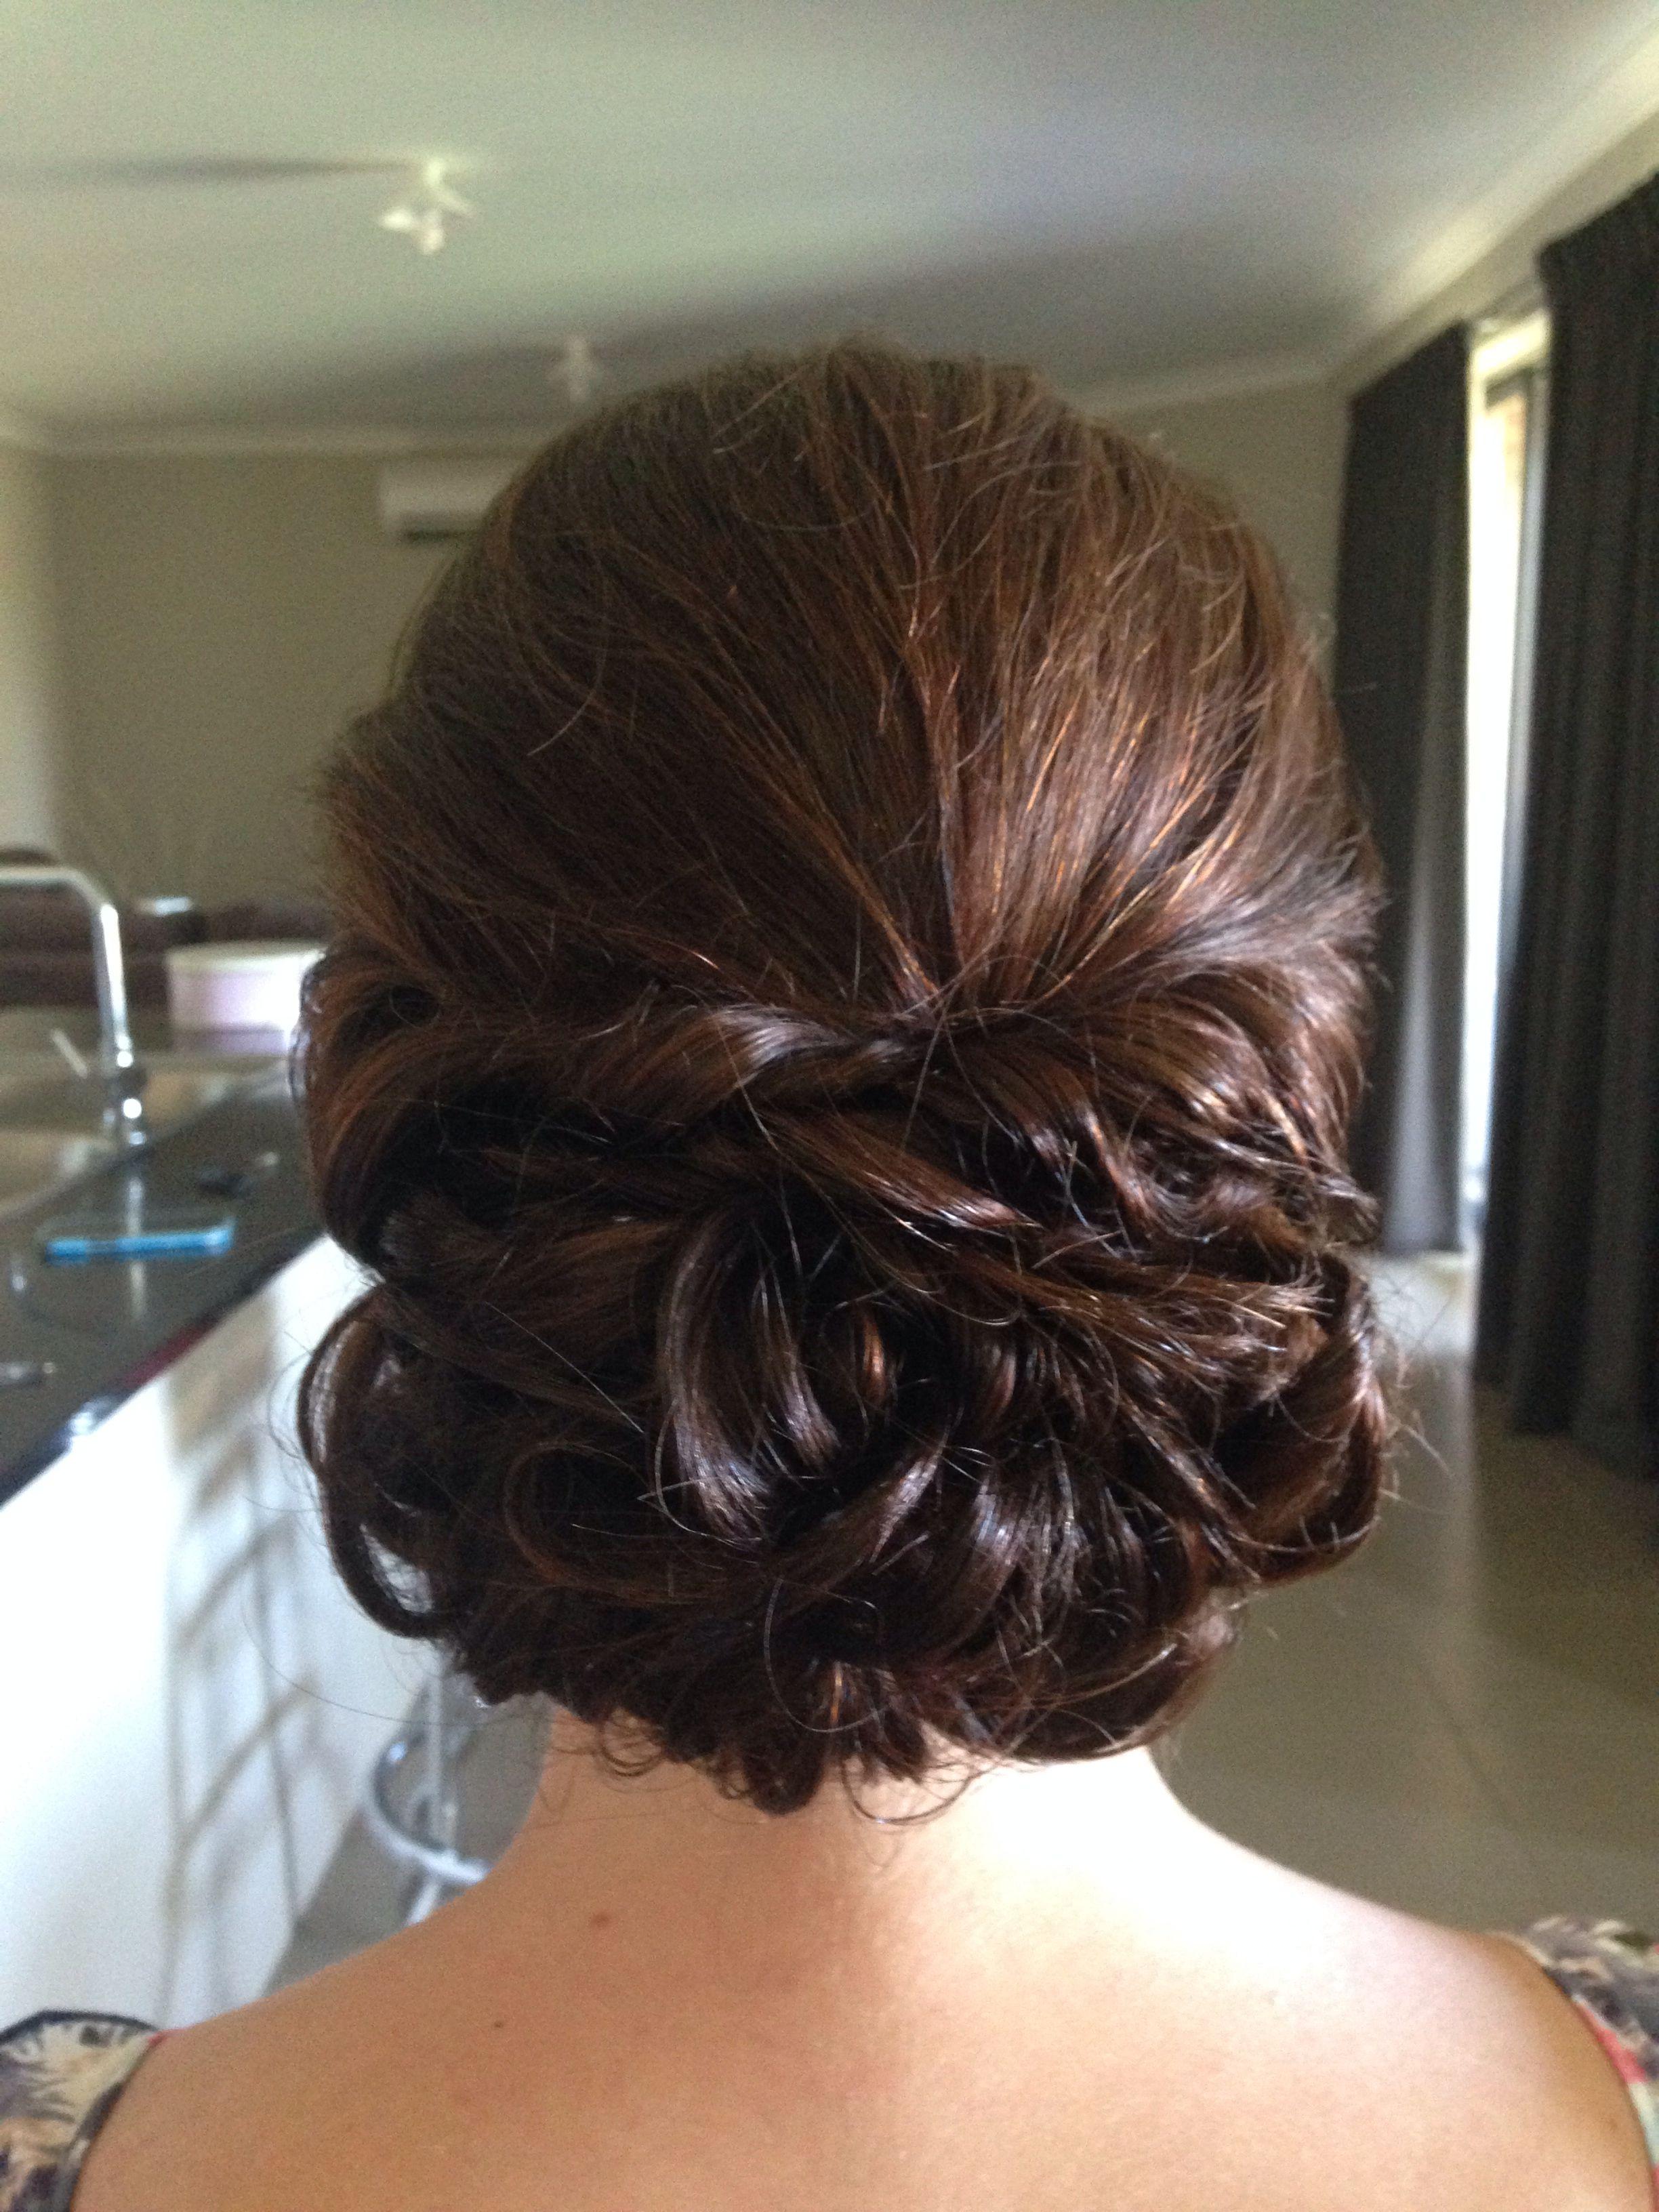 Loose curly bun Upstyle | Bridesmaid hair loose, Bun with curls, Curly bun